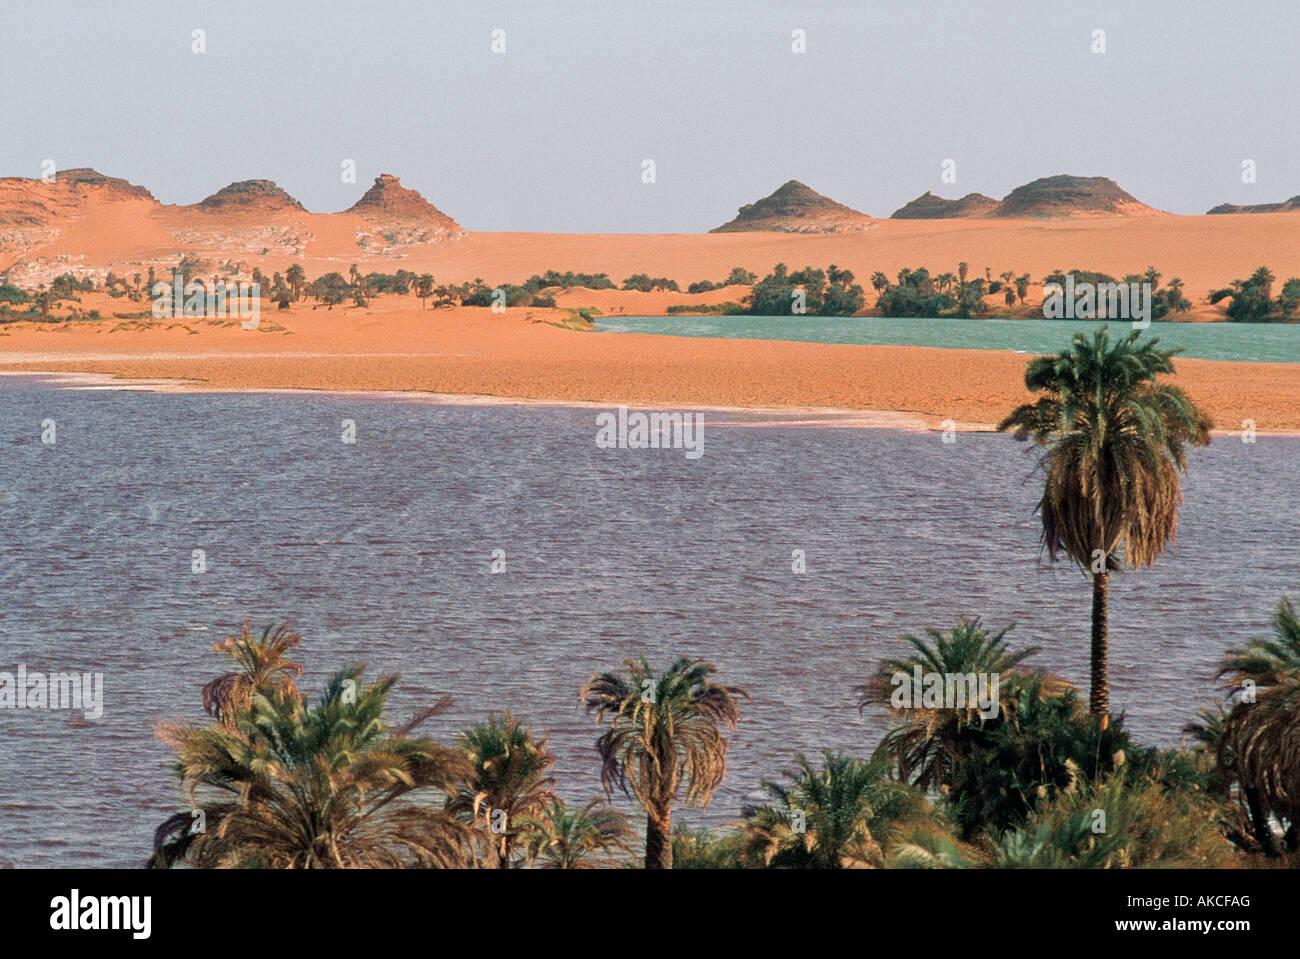 Lakes near Ounianga Kebir north eastern Chad Africa - Stock Image